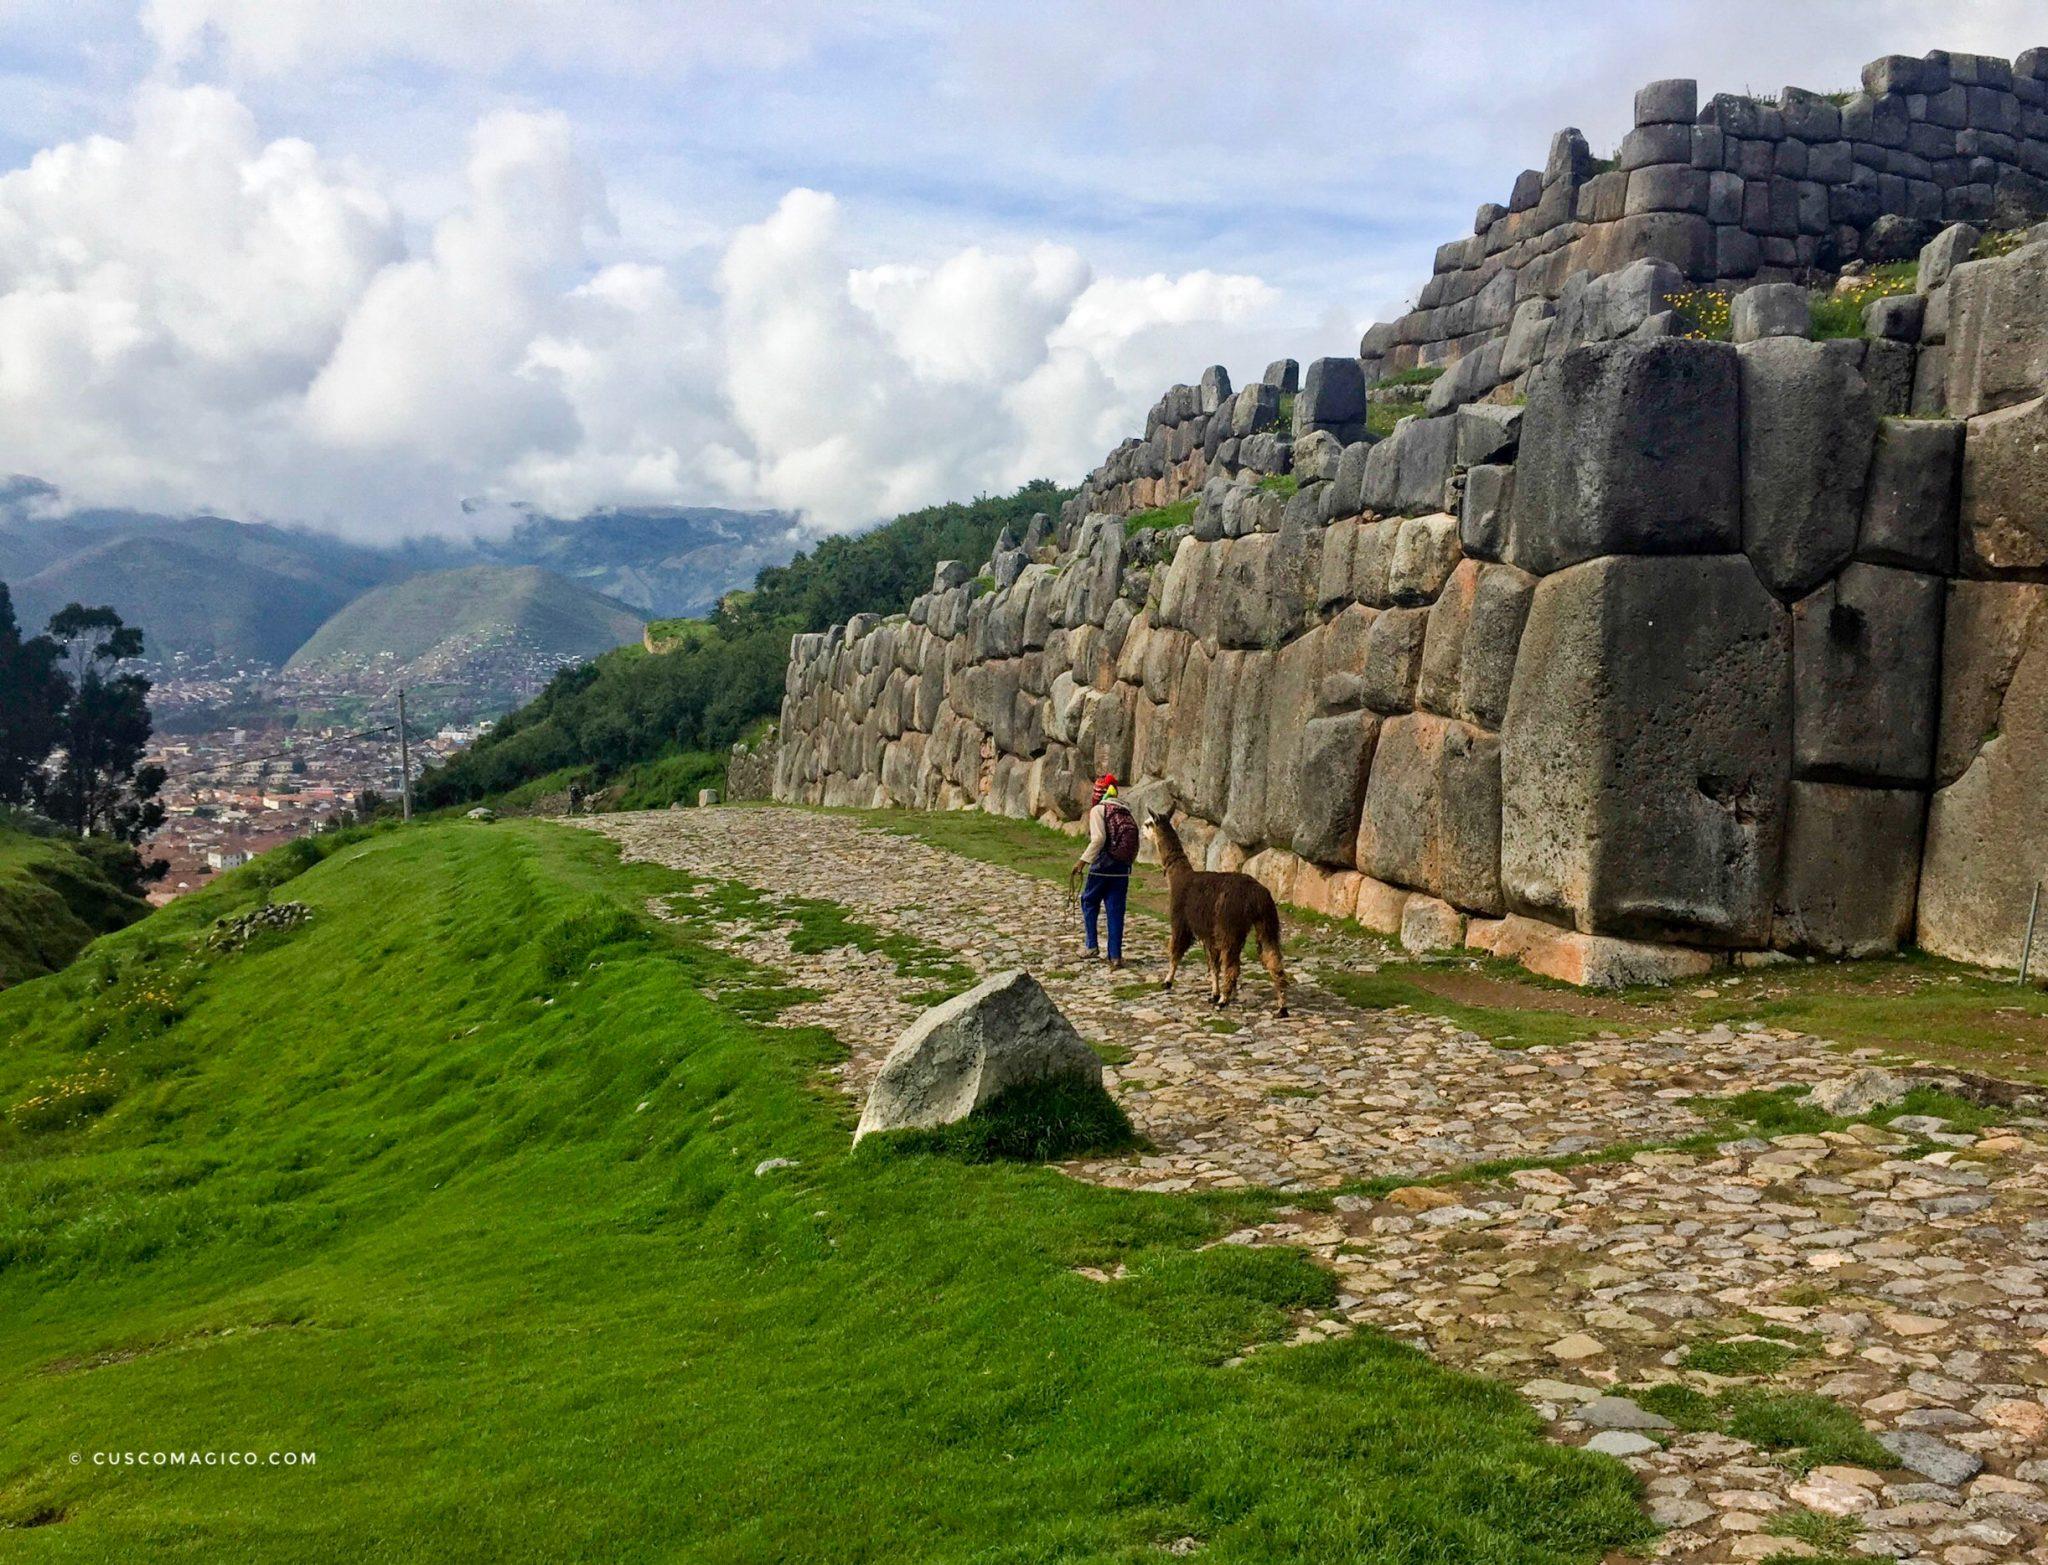 Cusco: Sacsayhuaman